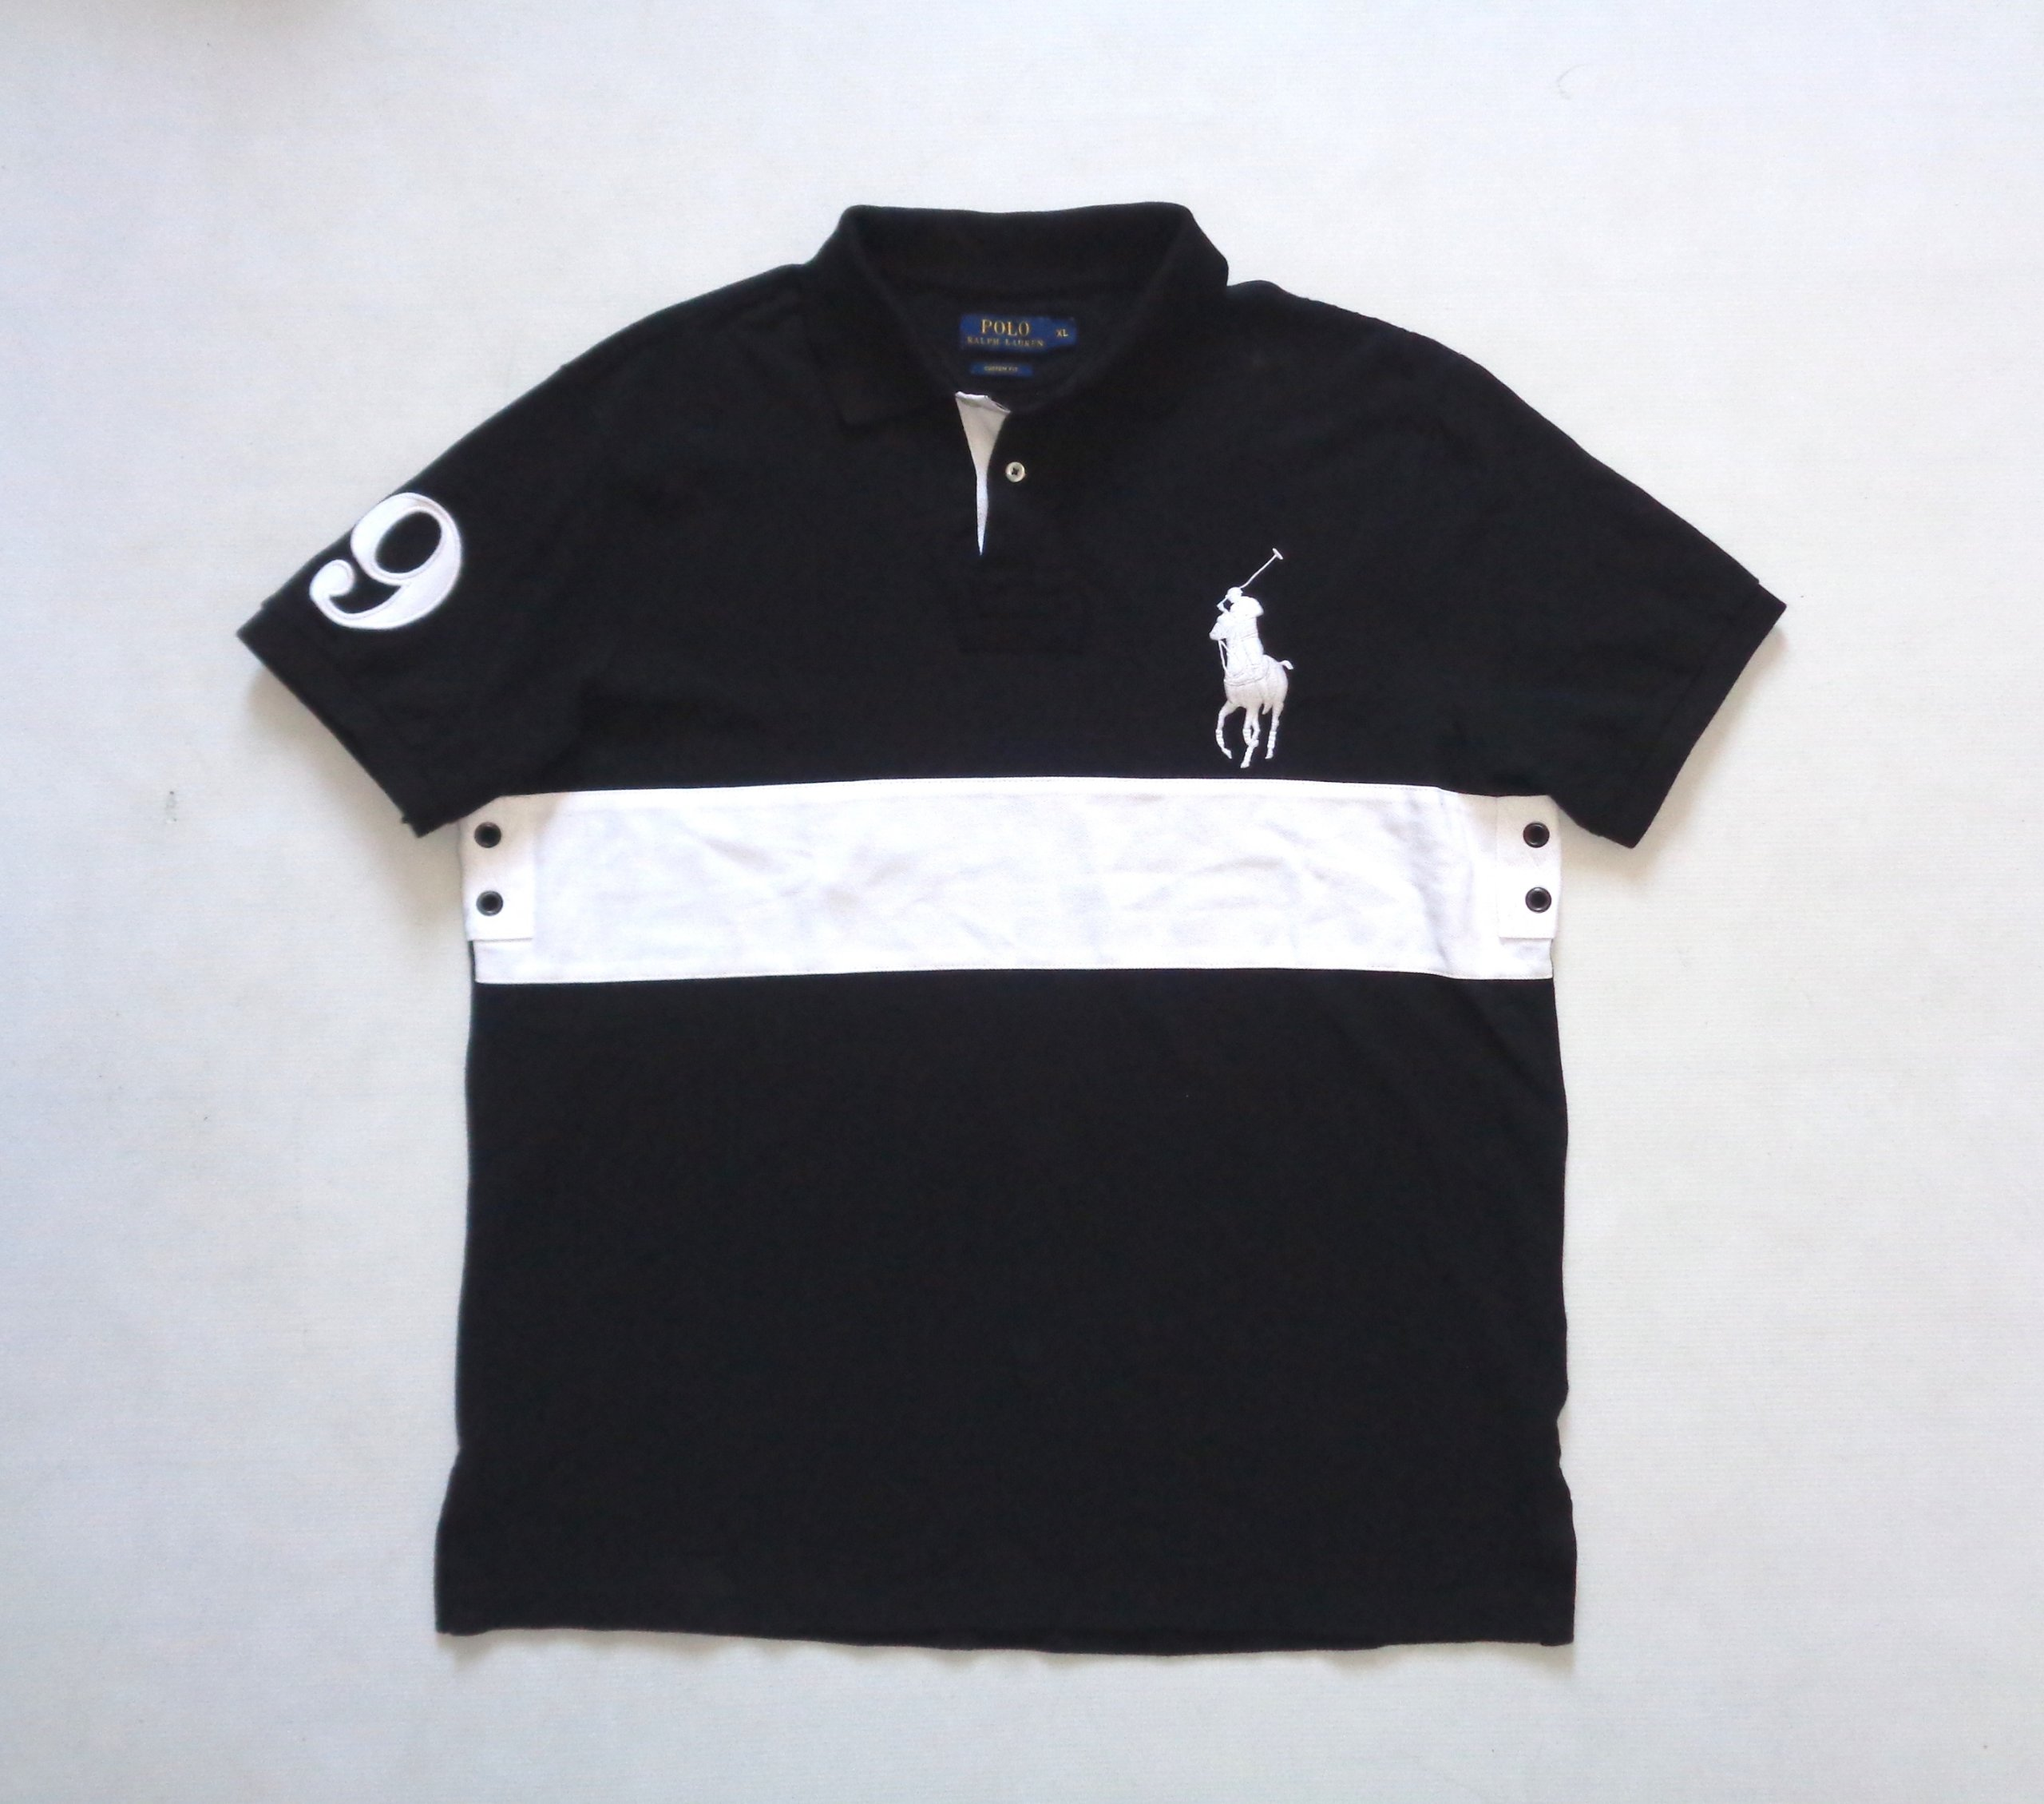 eb0464936 RALPH LAUREN koszulka męska POLO - XL - HIT - 7211127800 ...